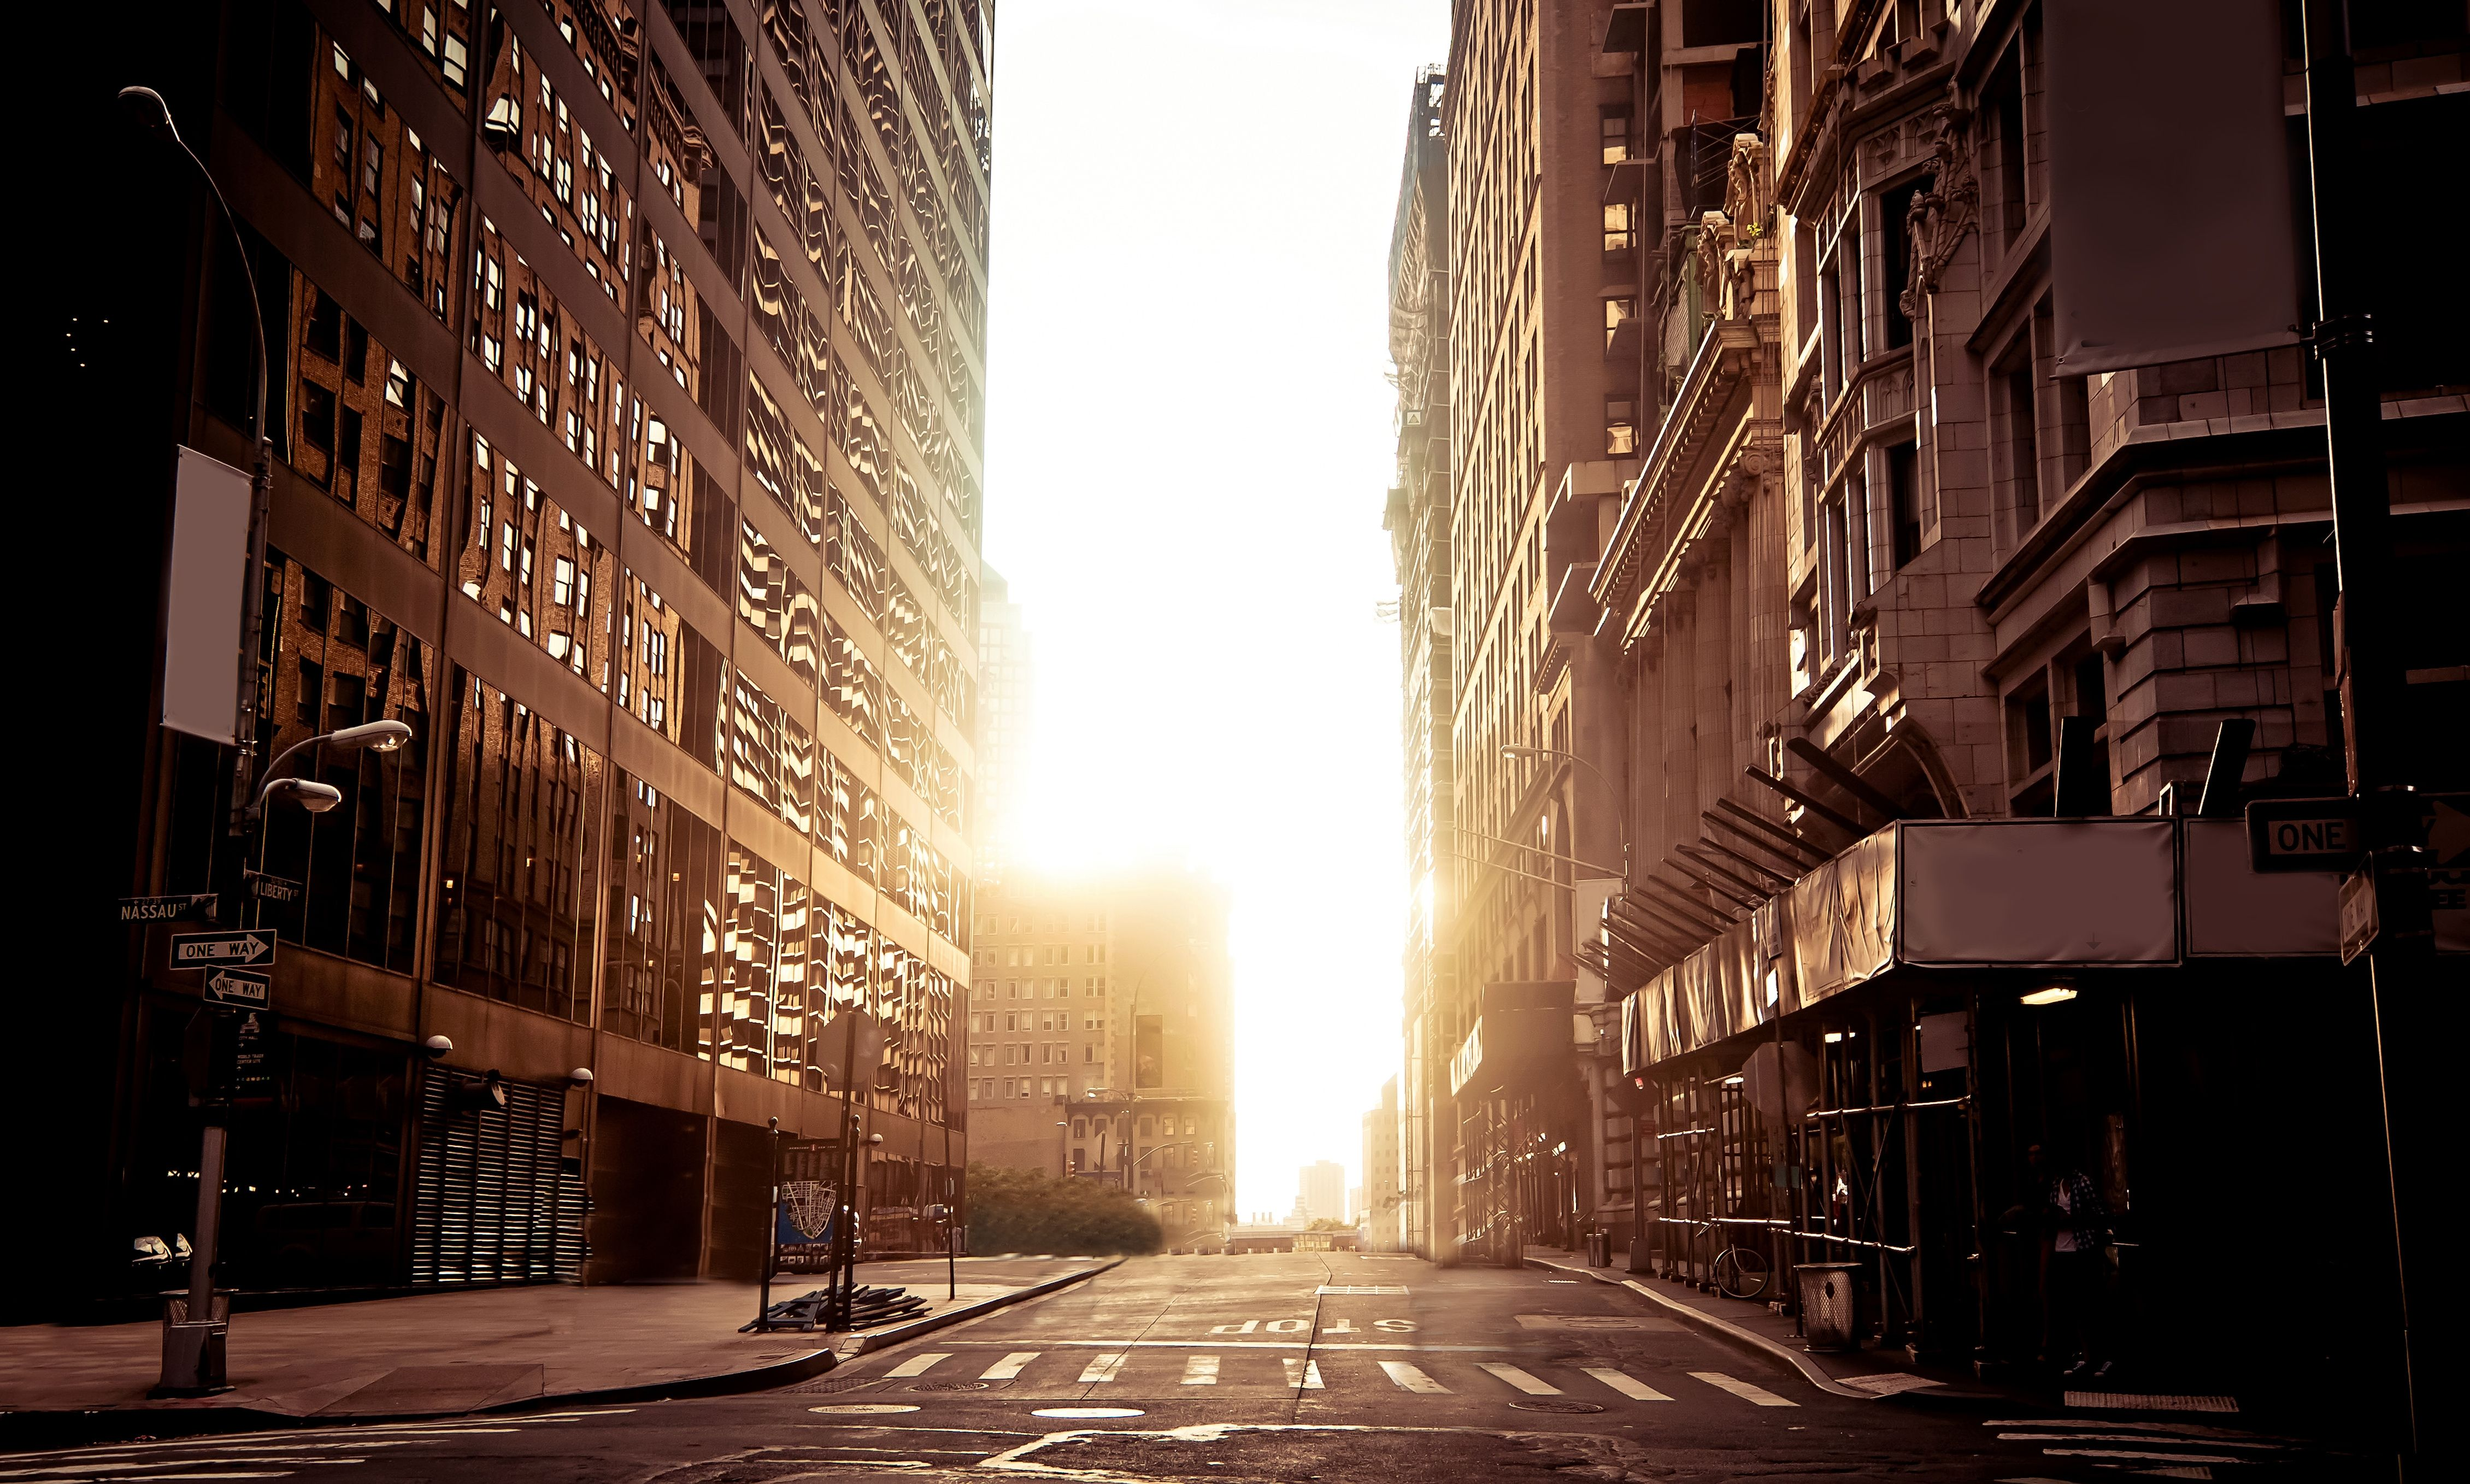 city sunset wallpaper 7106 - photo #28